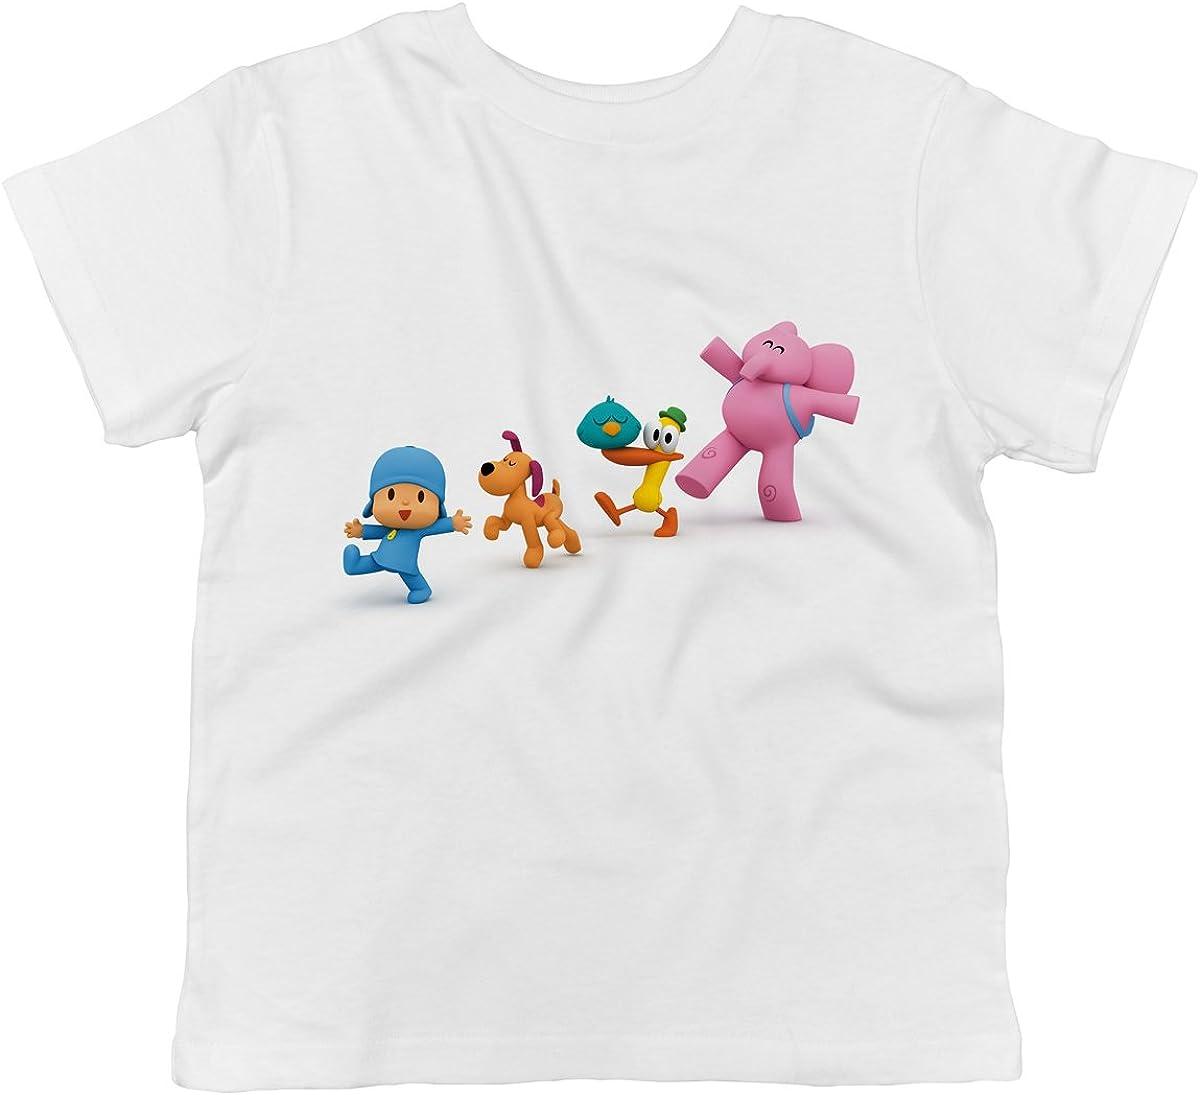 Pocoyo Pato Pocoyo Sleepy Bird and Elly Marching Toddler T-Shirt Loula